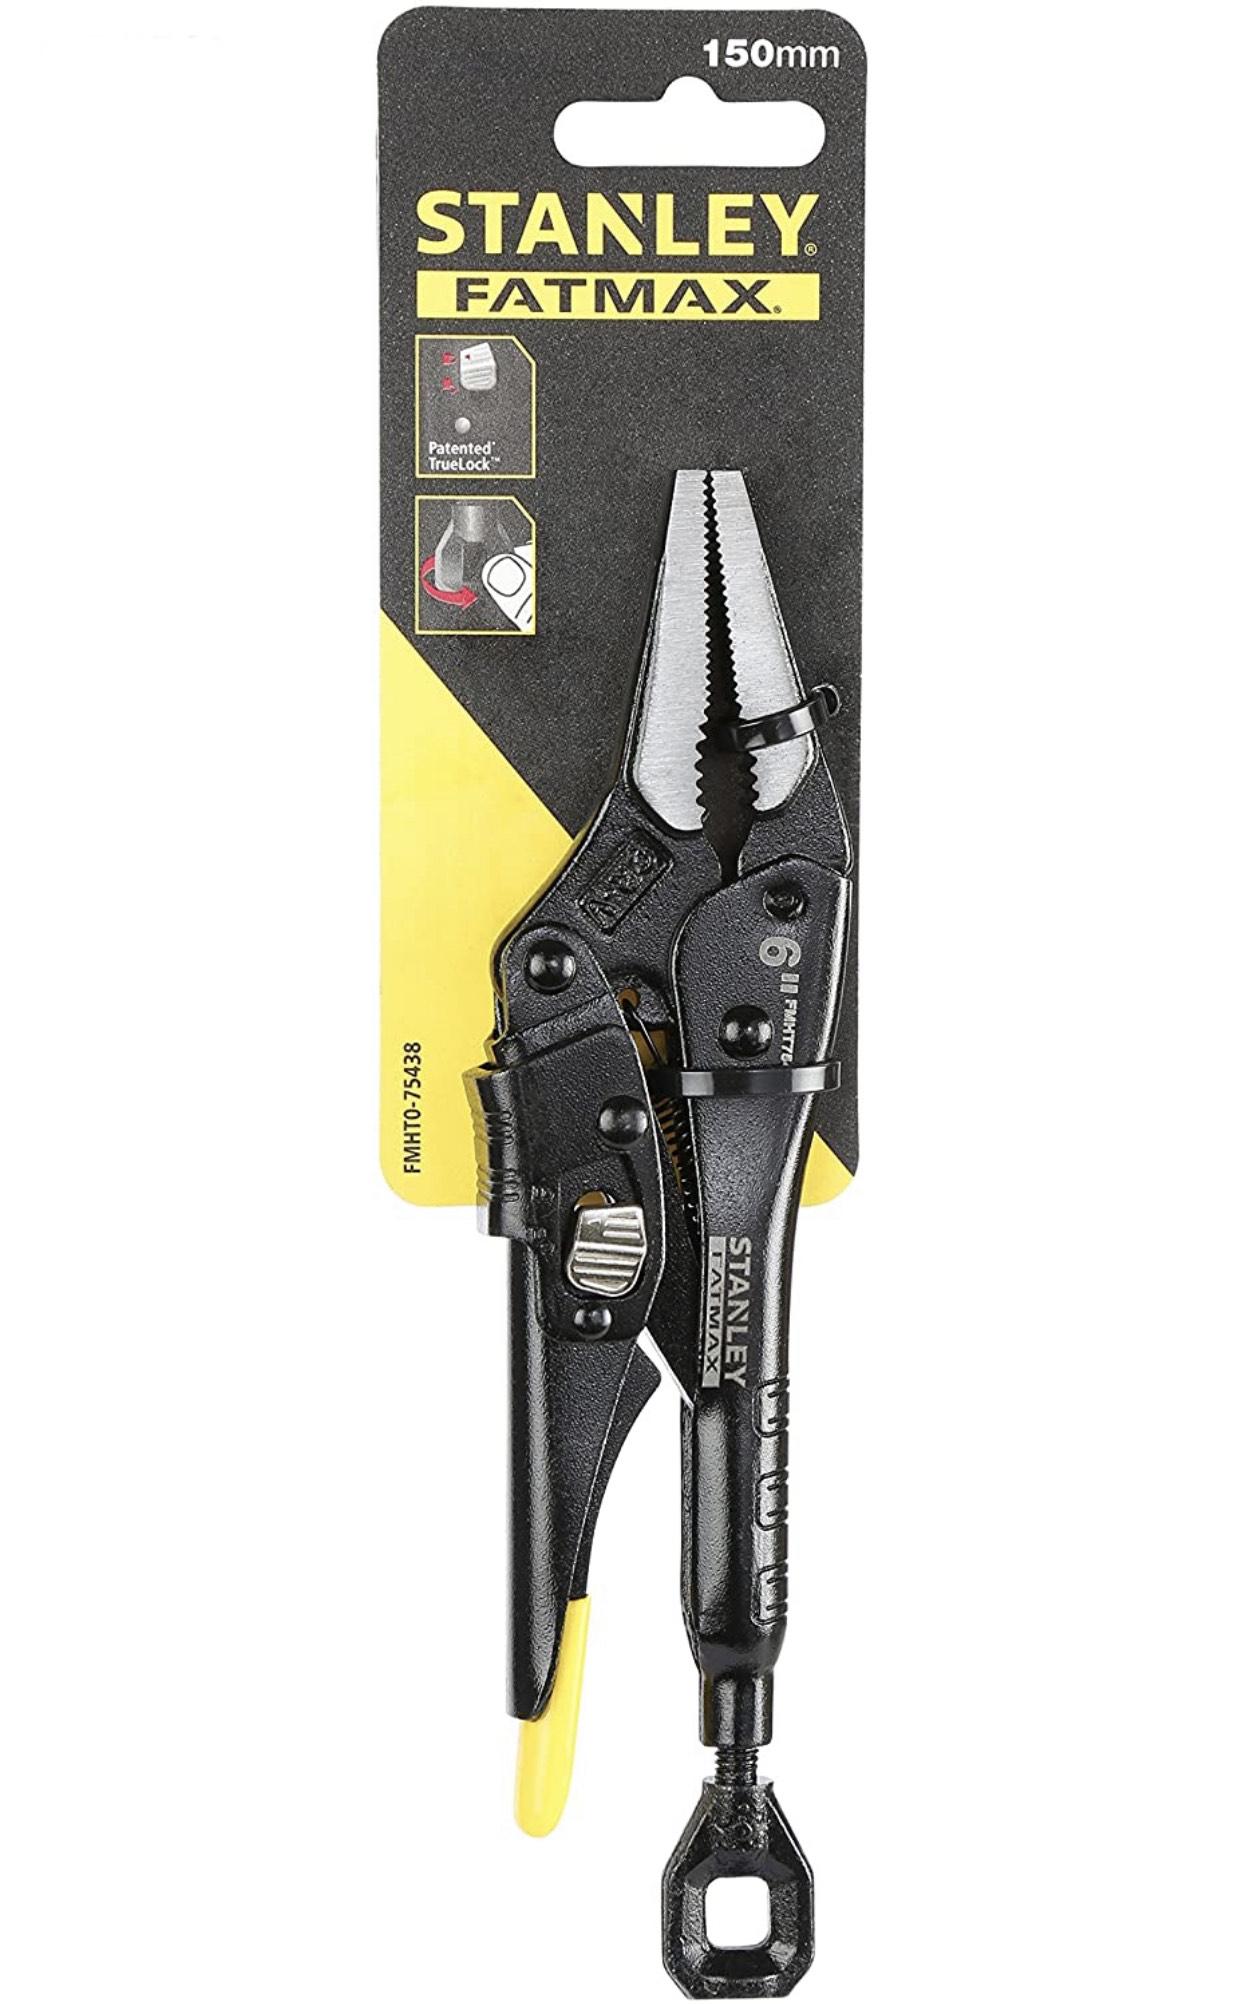 STANLEY FMHT0-75438 150 mm Fatmax Locking Mole Grip Long Nose Pliers - Black - £14.50 (+£4.49 Non Prime) @ Amazon